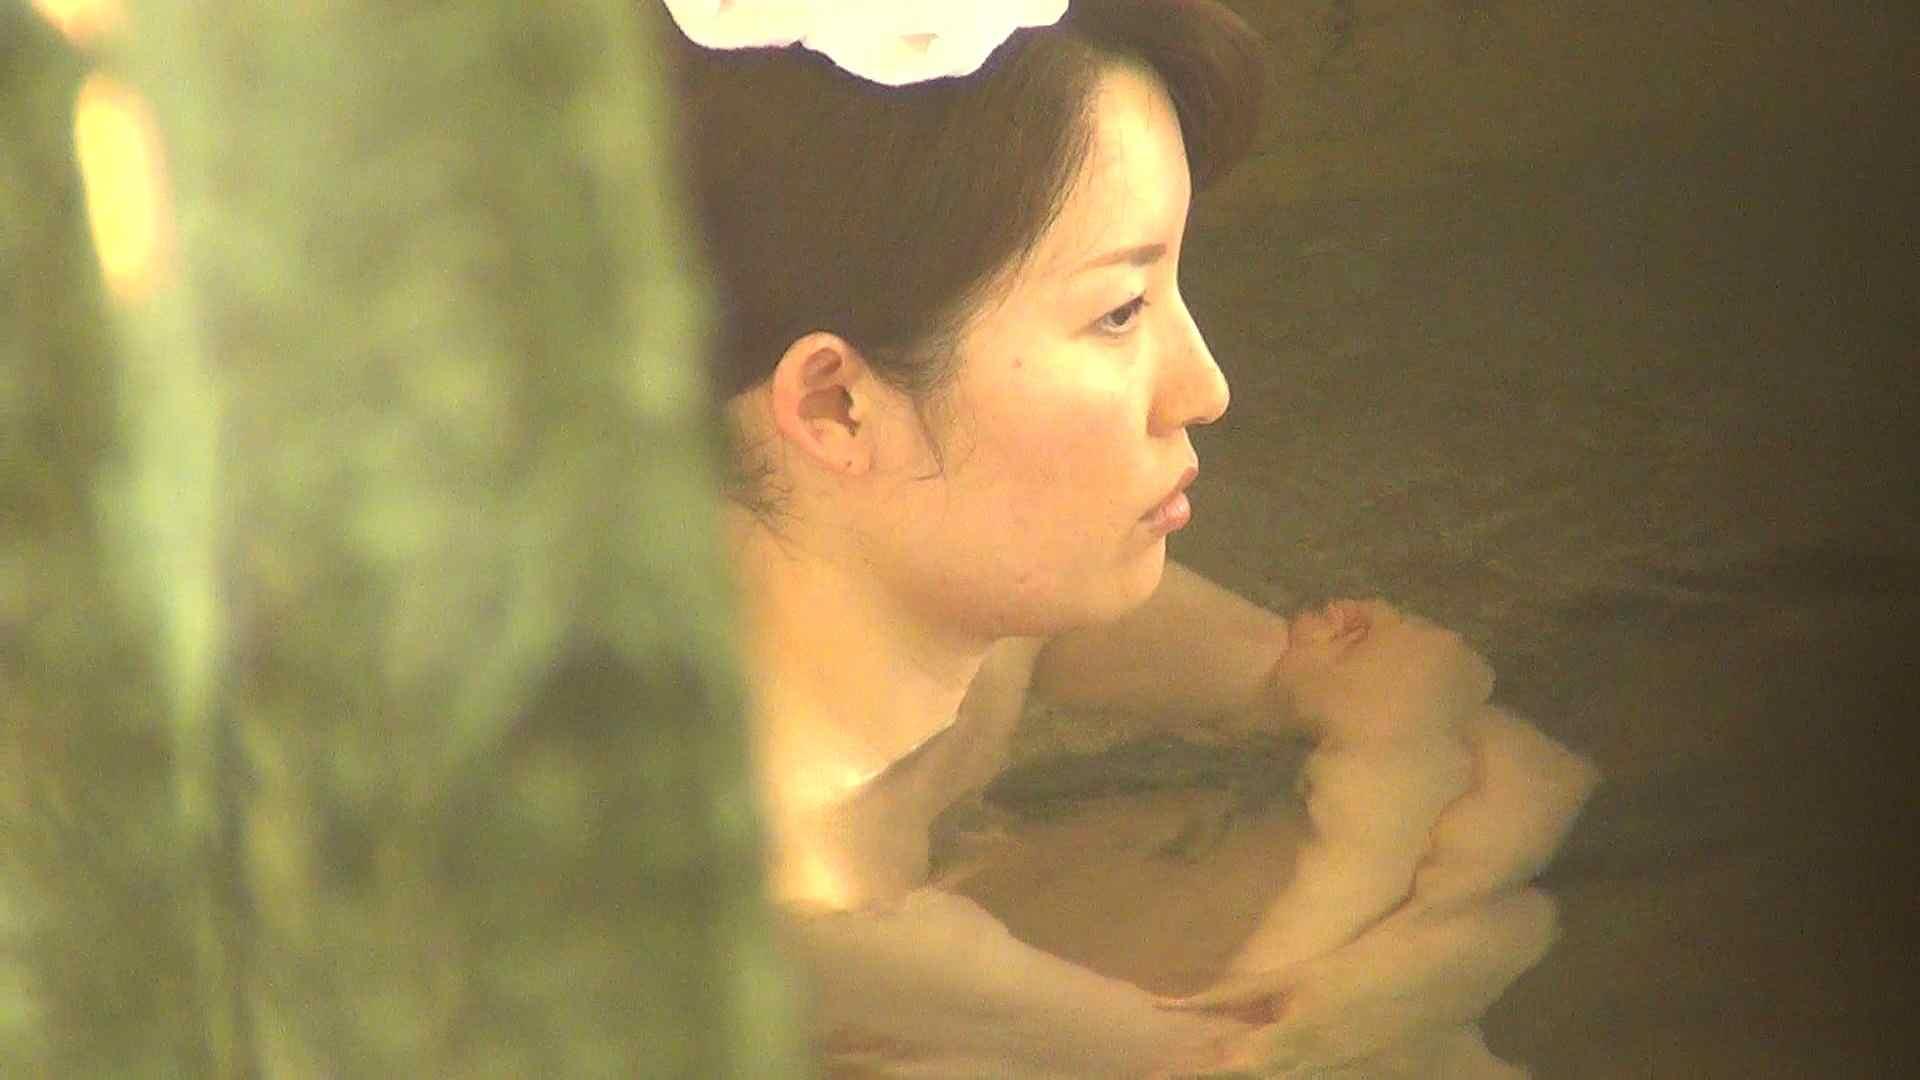 Aquaな露天風呂Vol.301 OLセックス 隠し撮りすけべAV動画紹介 85画像 77